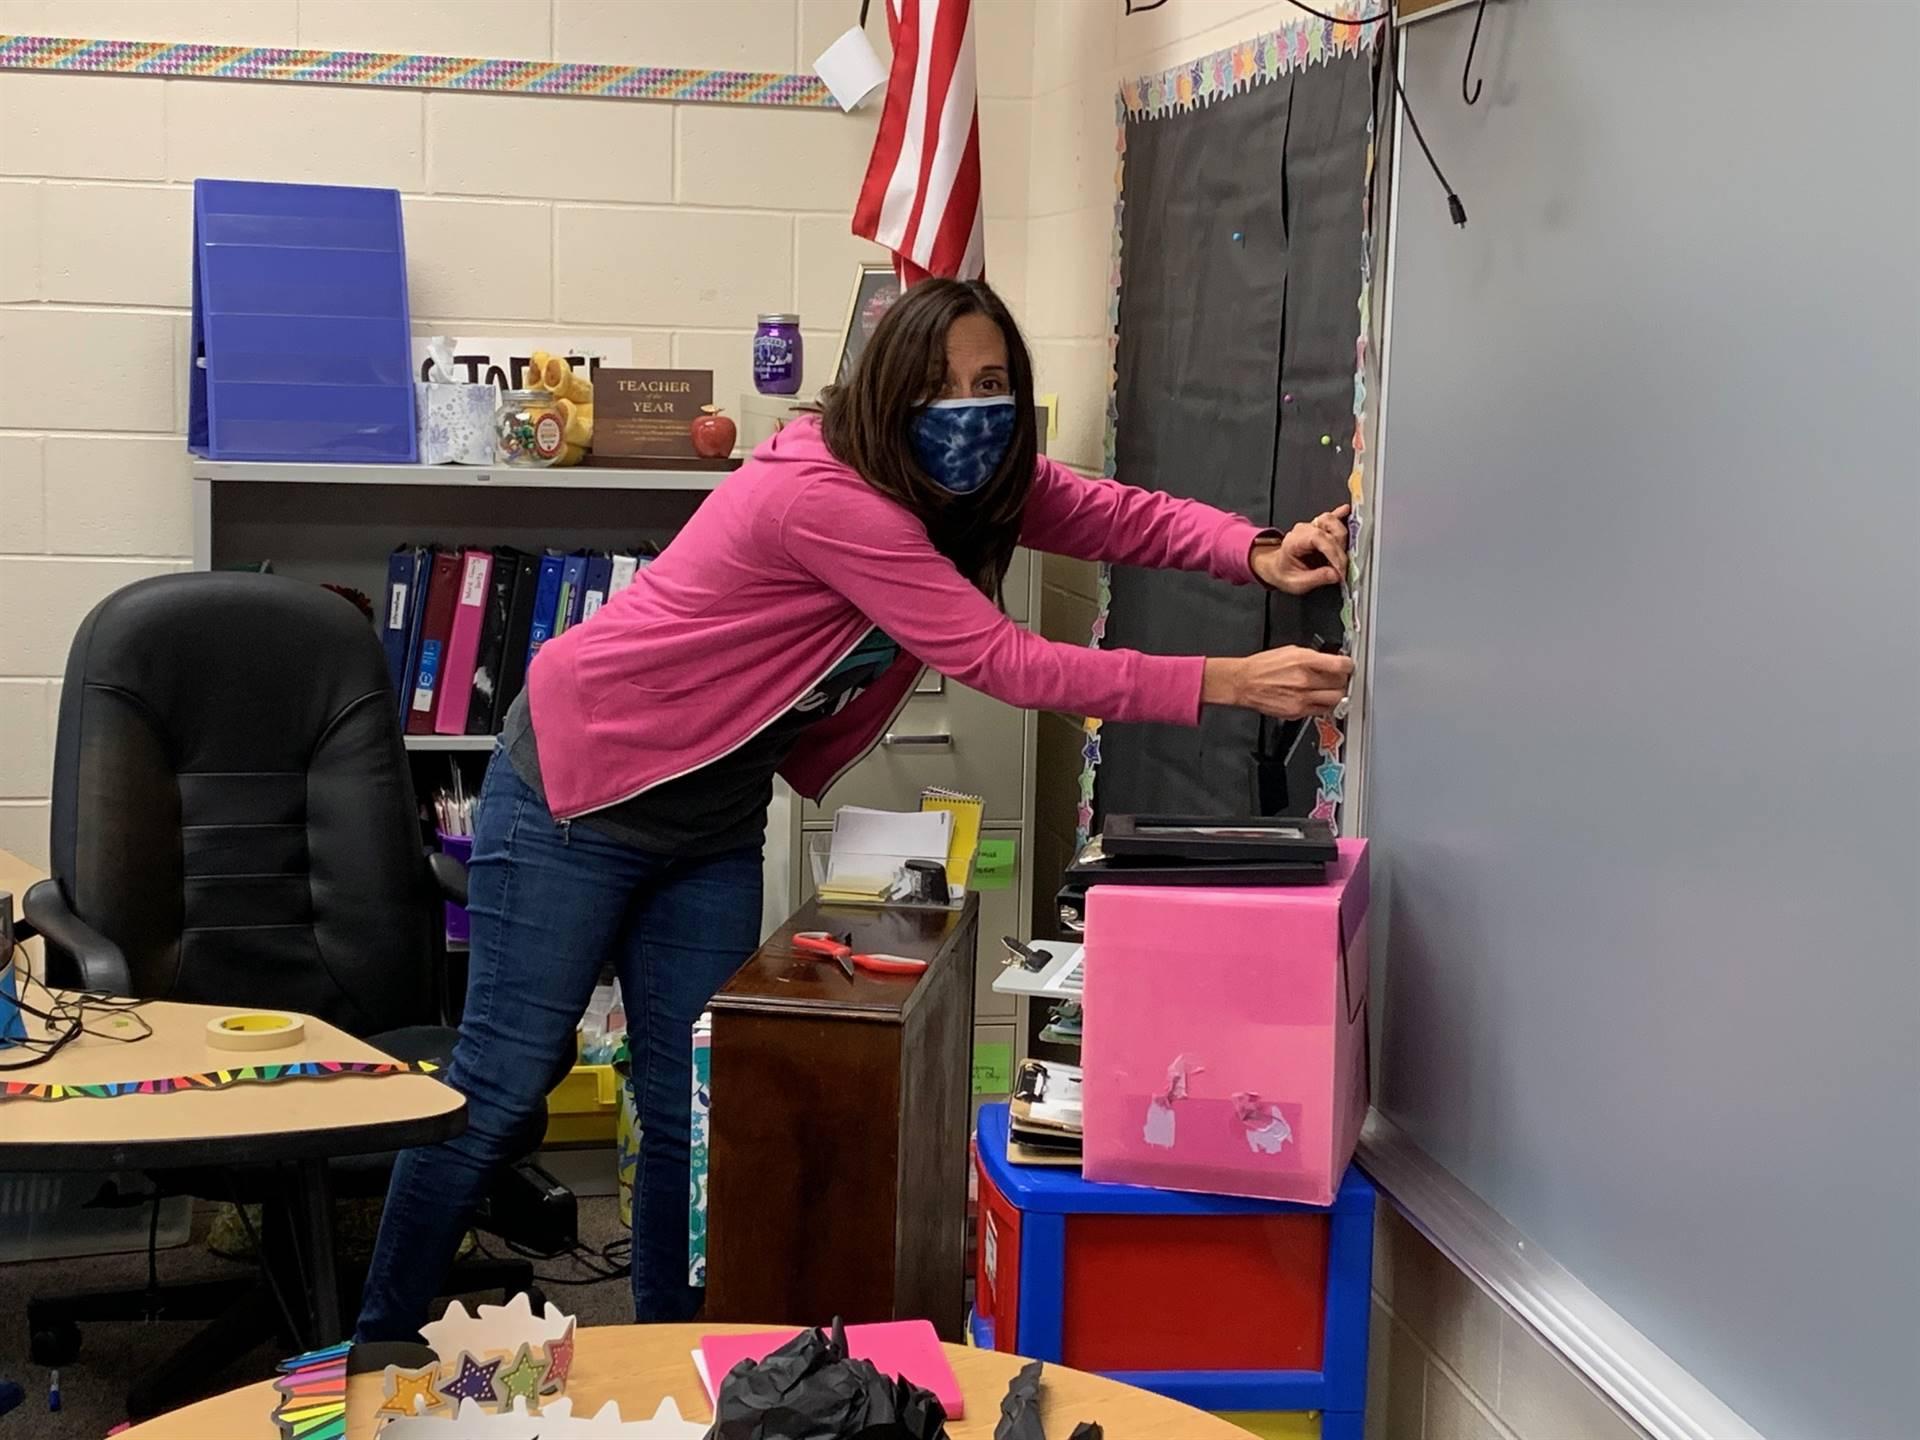 Teacher working on bulletin board